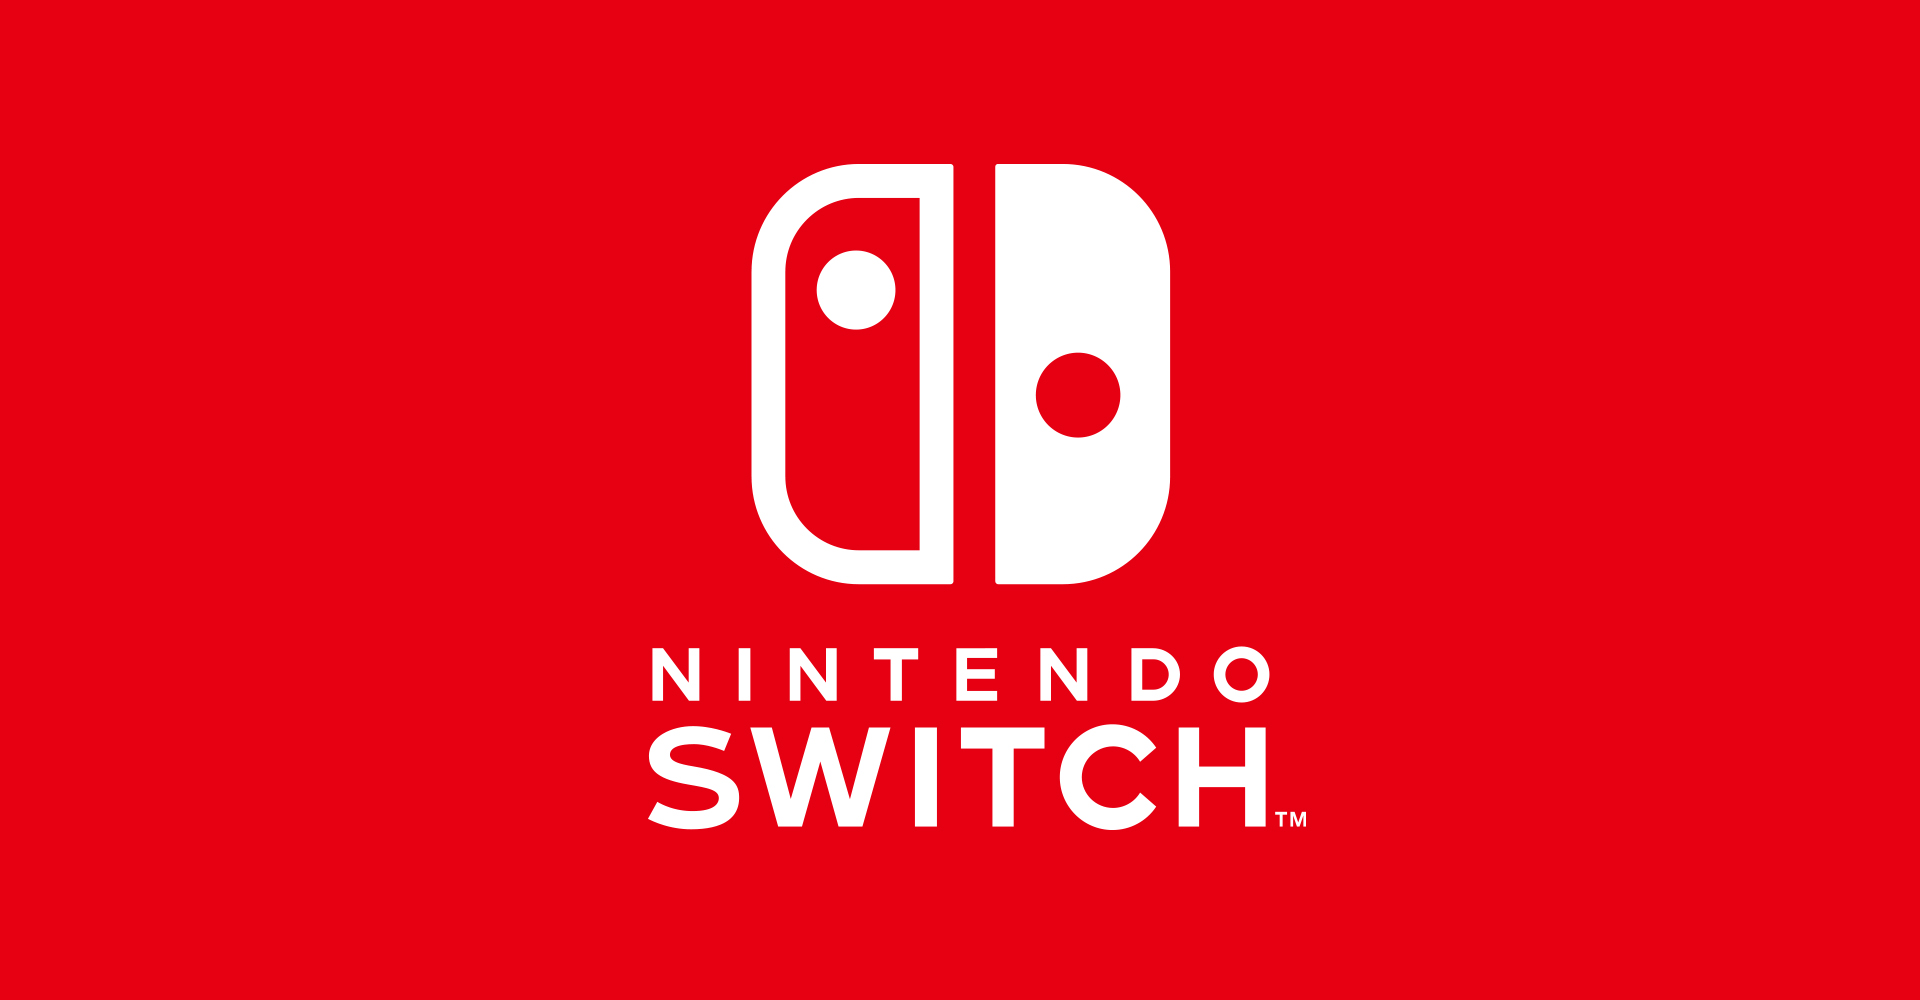 Nintendo spune ca serviciul sau de gaming online va merita asteptarea